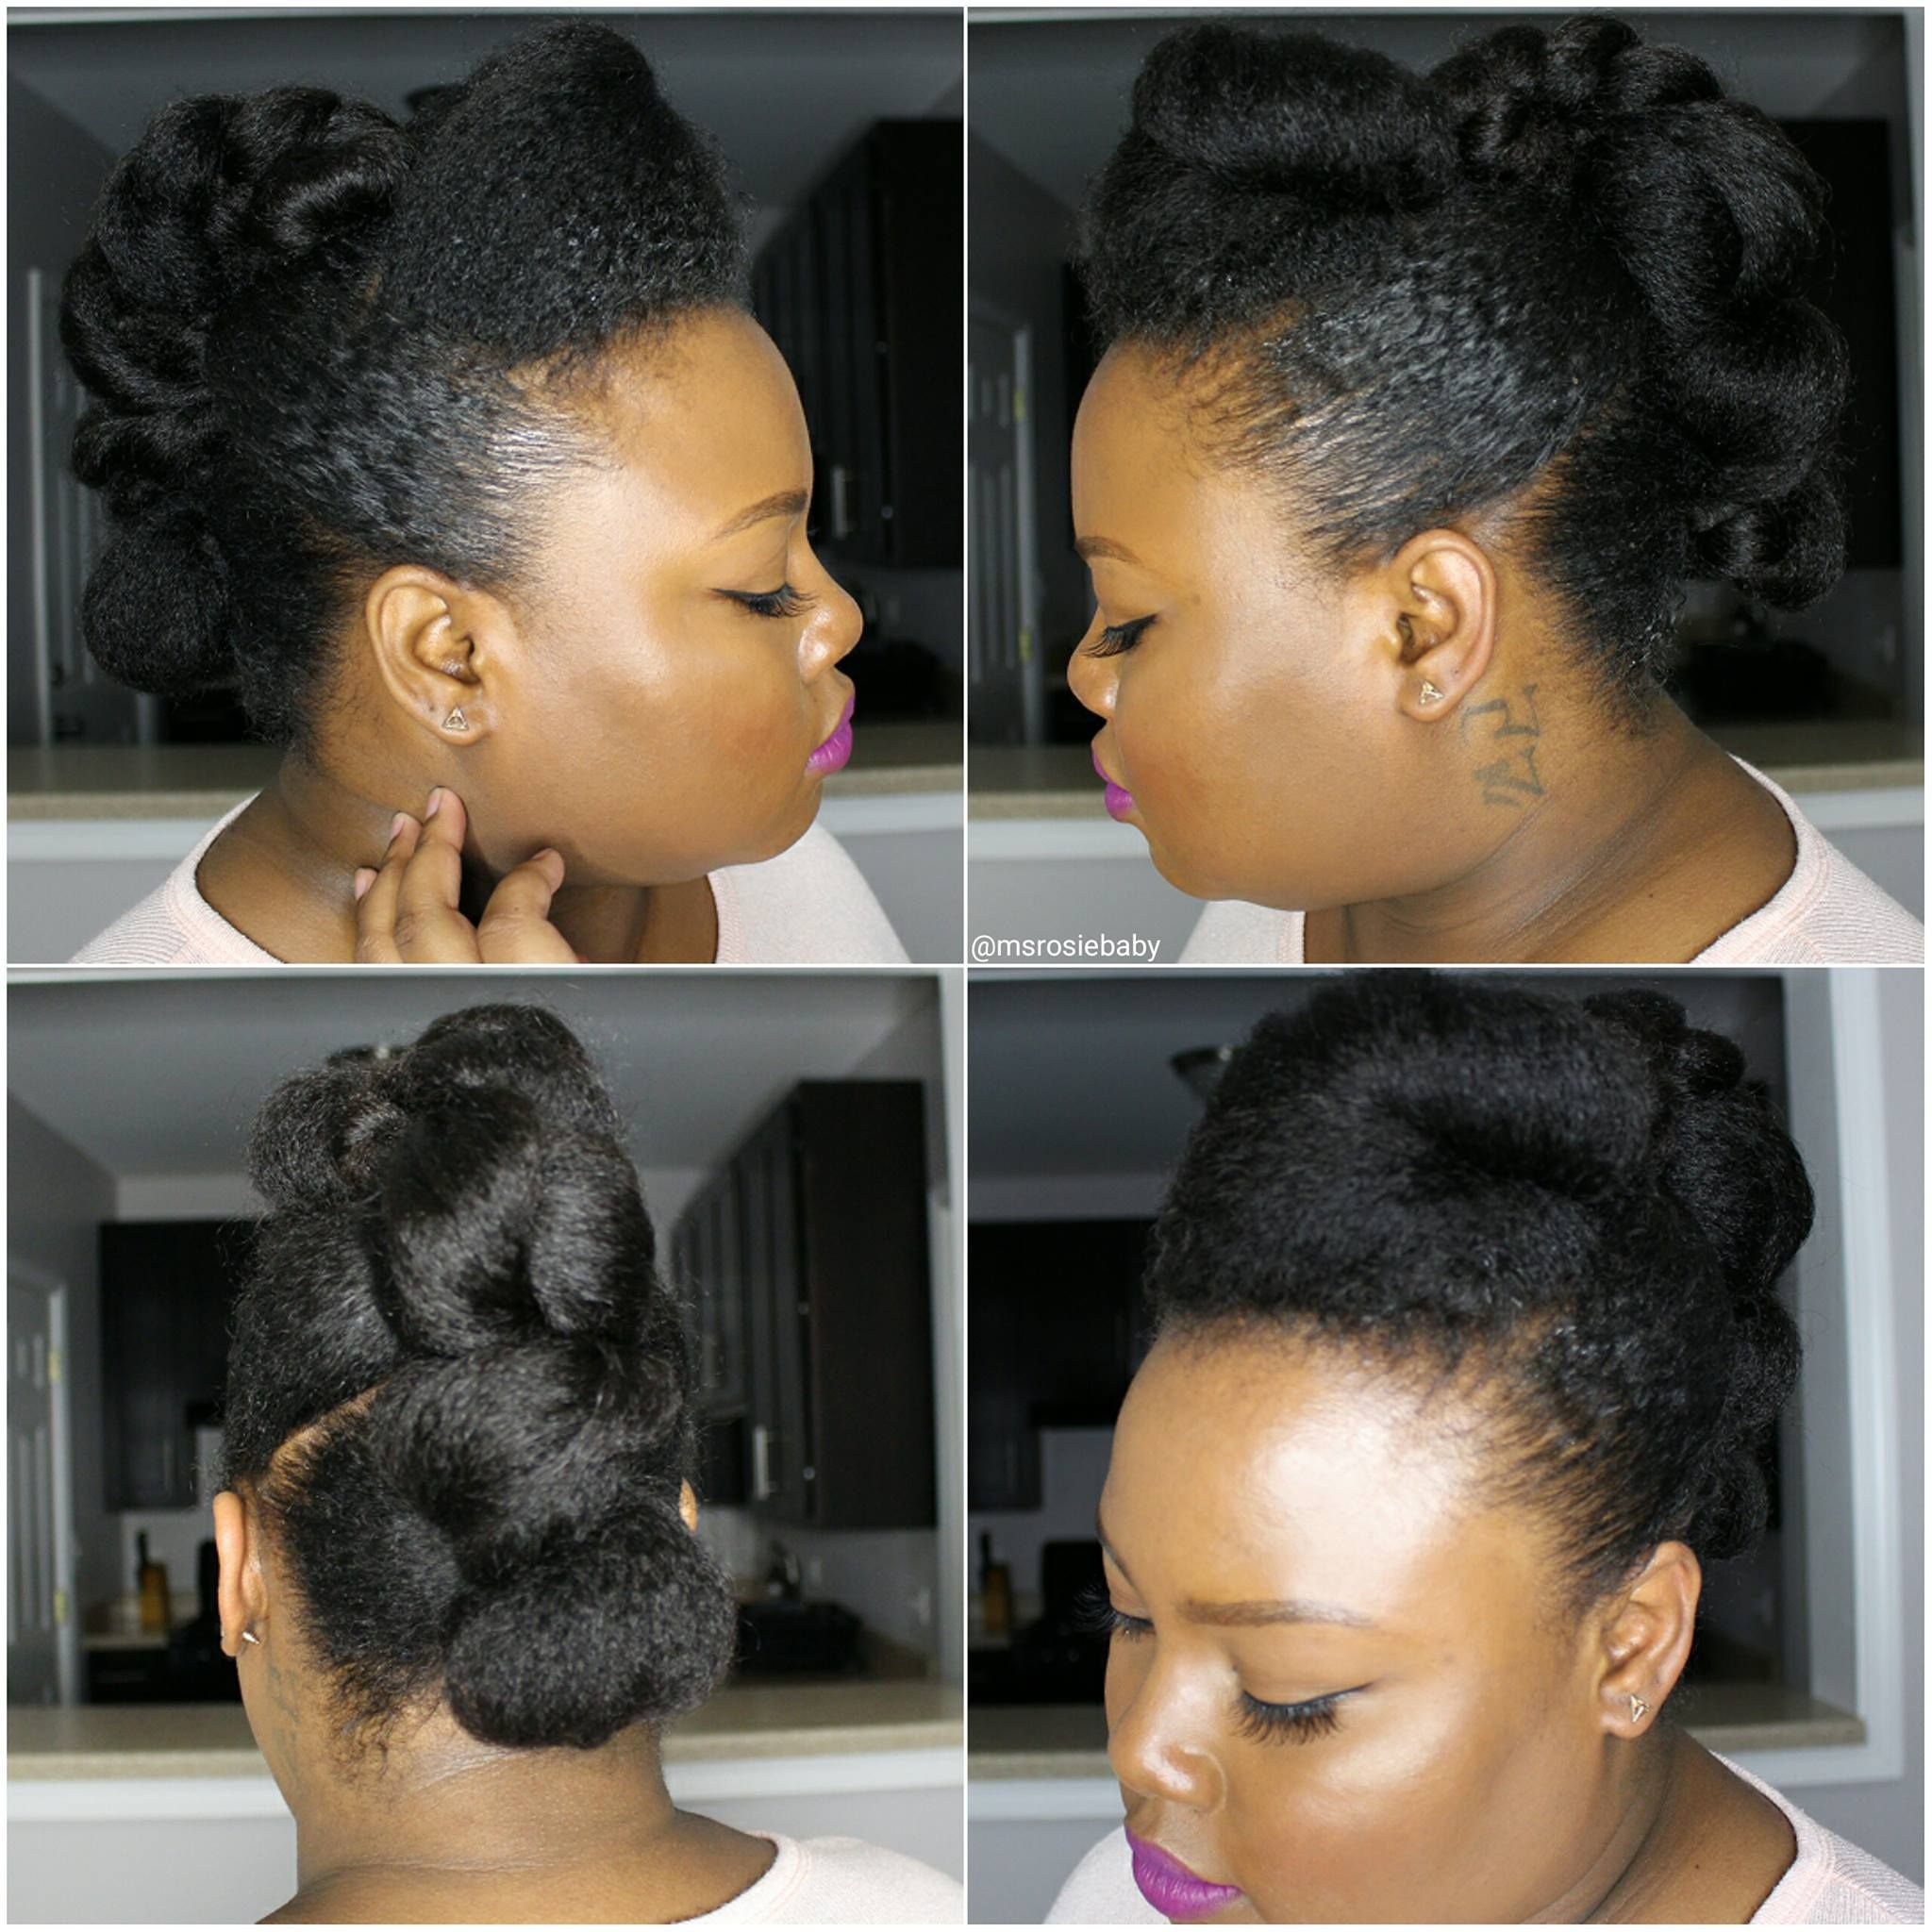 @msrosiebaby| Natural Hair Up-Do 04.27.2016